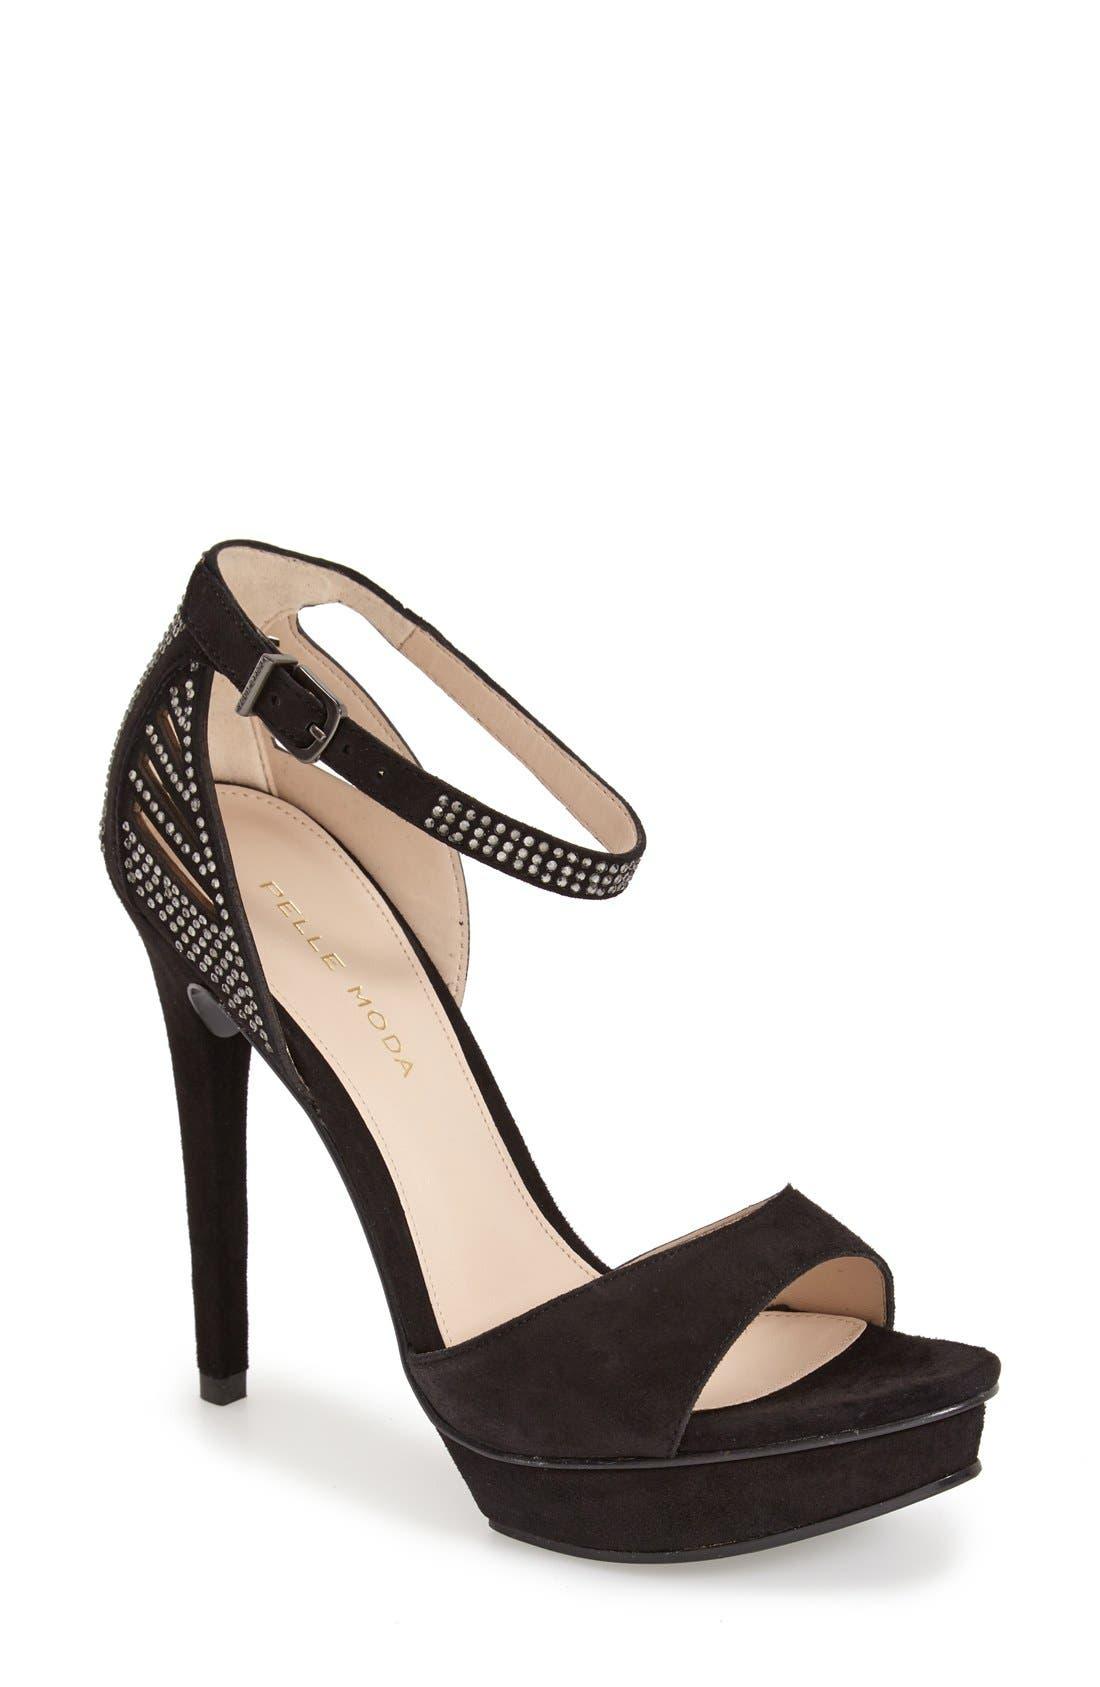 'Fenton' Ankle Strap Sandal,                             Main thumbnail 1, color,